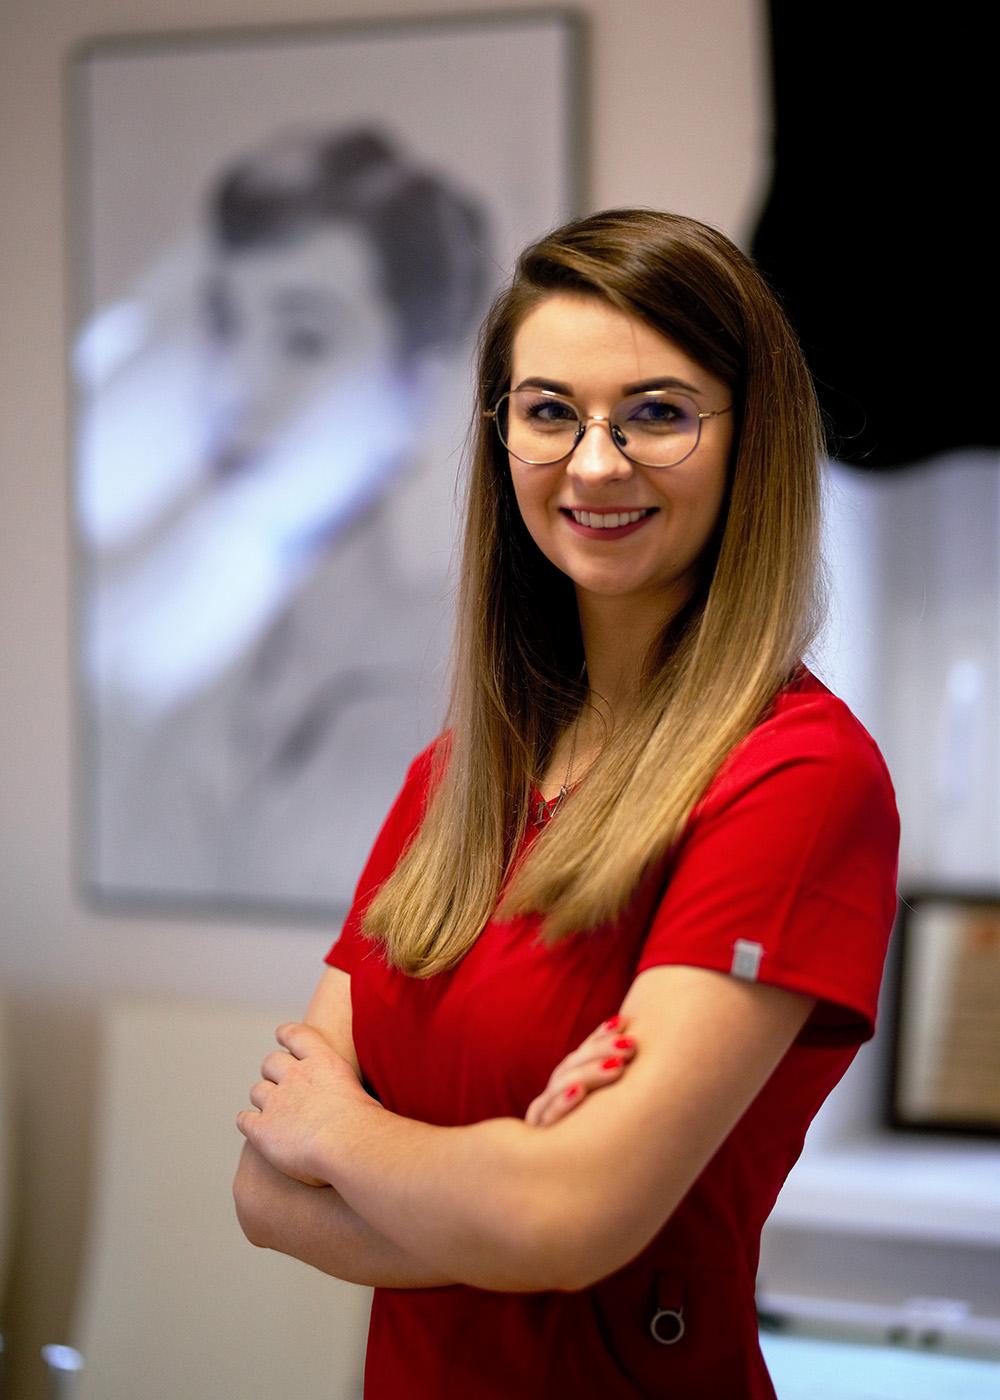 Marta Nodzak